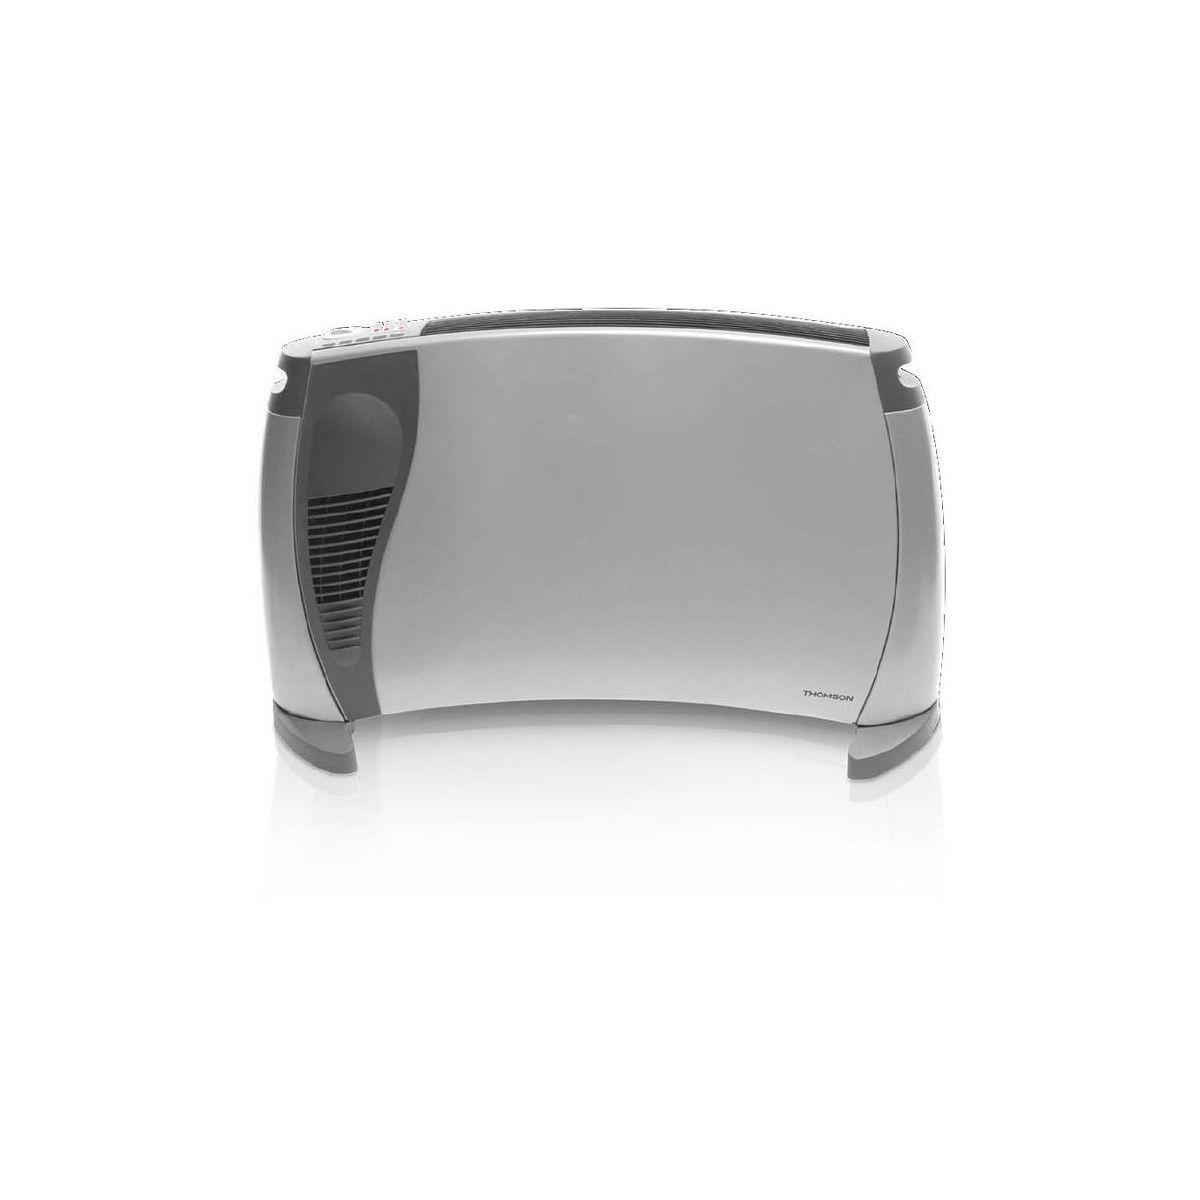 Chauffage THCT001T Silver 2000 W